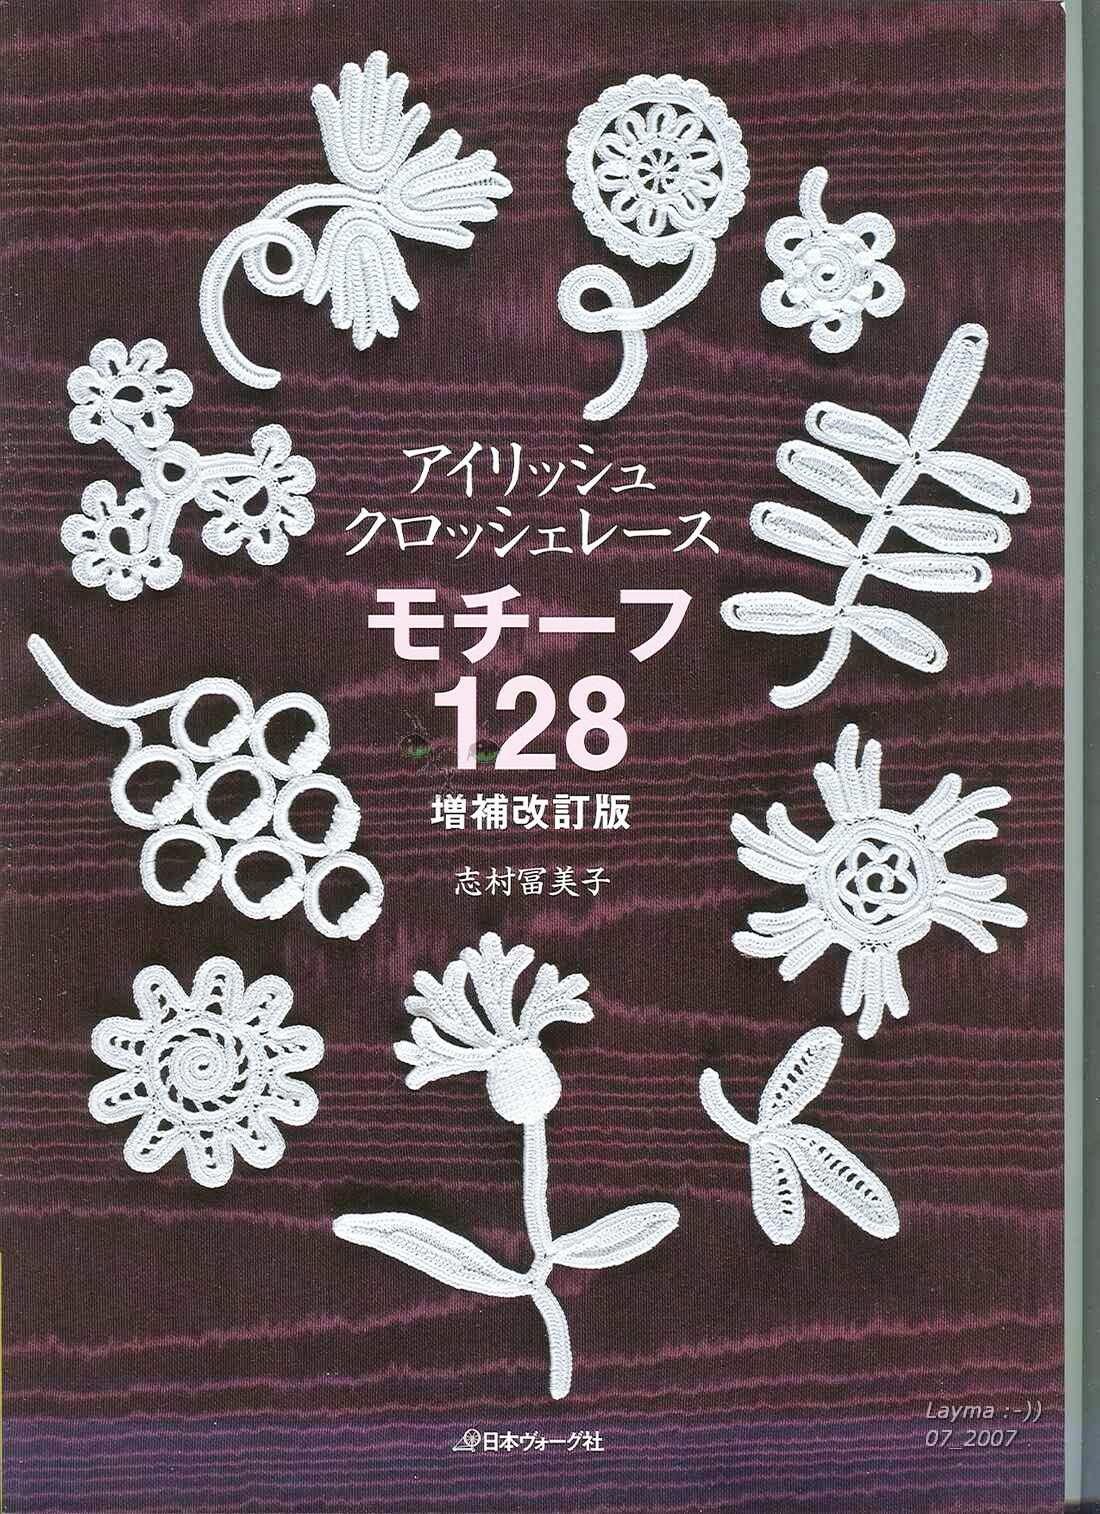 Revista IRIS MOTIVS Apliques Patrones - Patrones Crochet